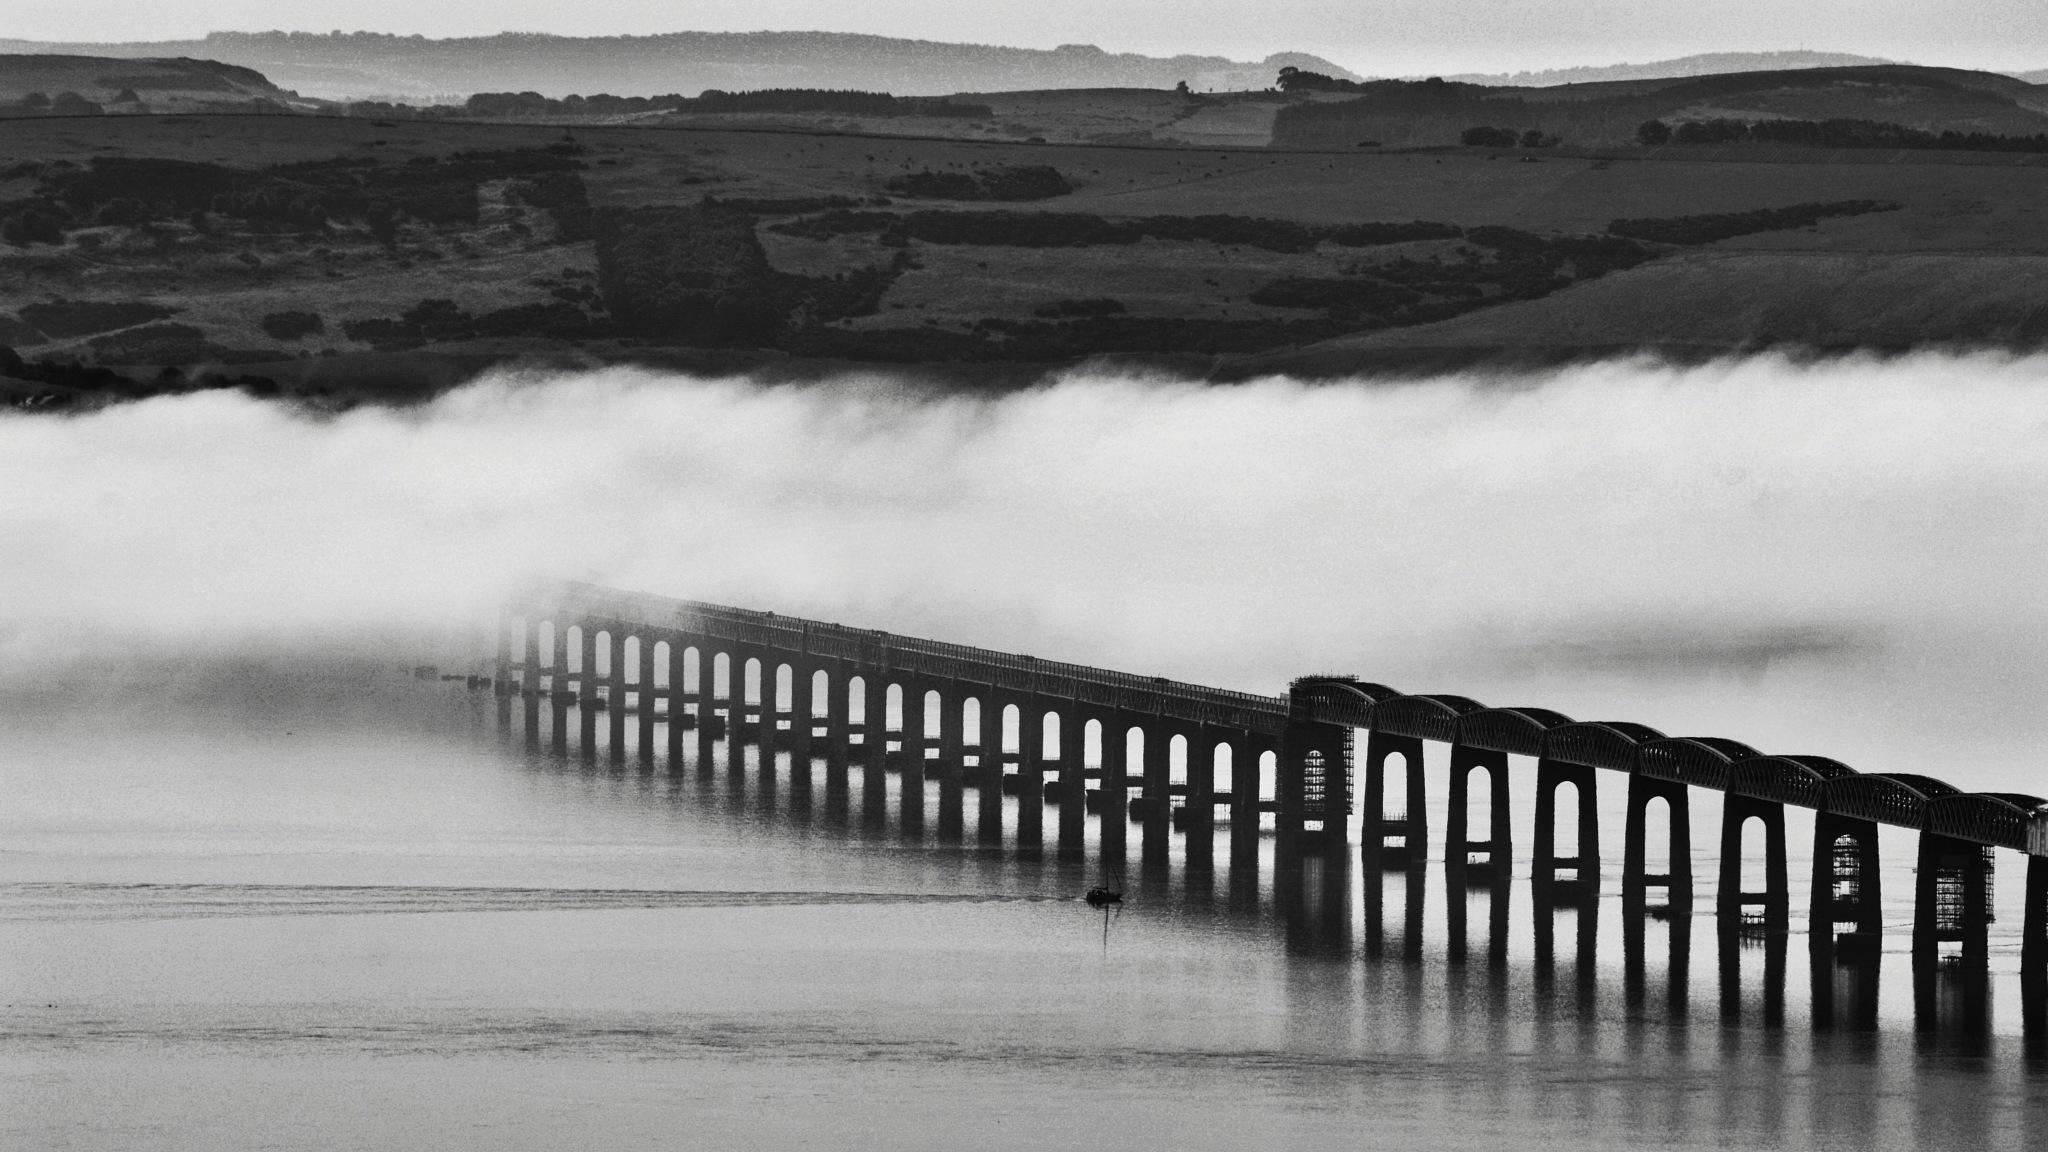 Tay Rail Bridge, Scotland  by The PhotoGrabber